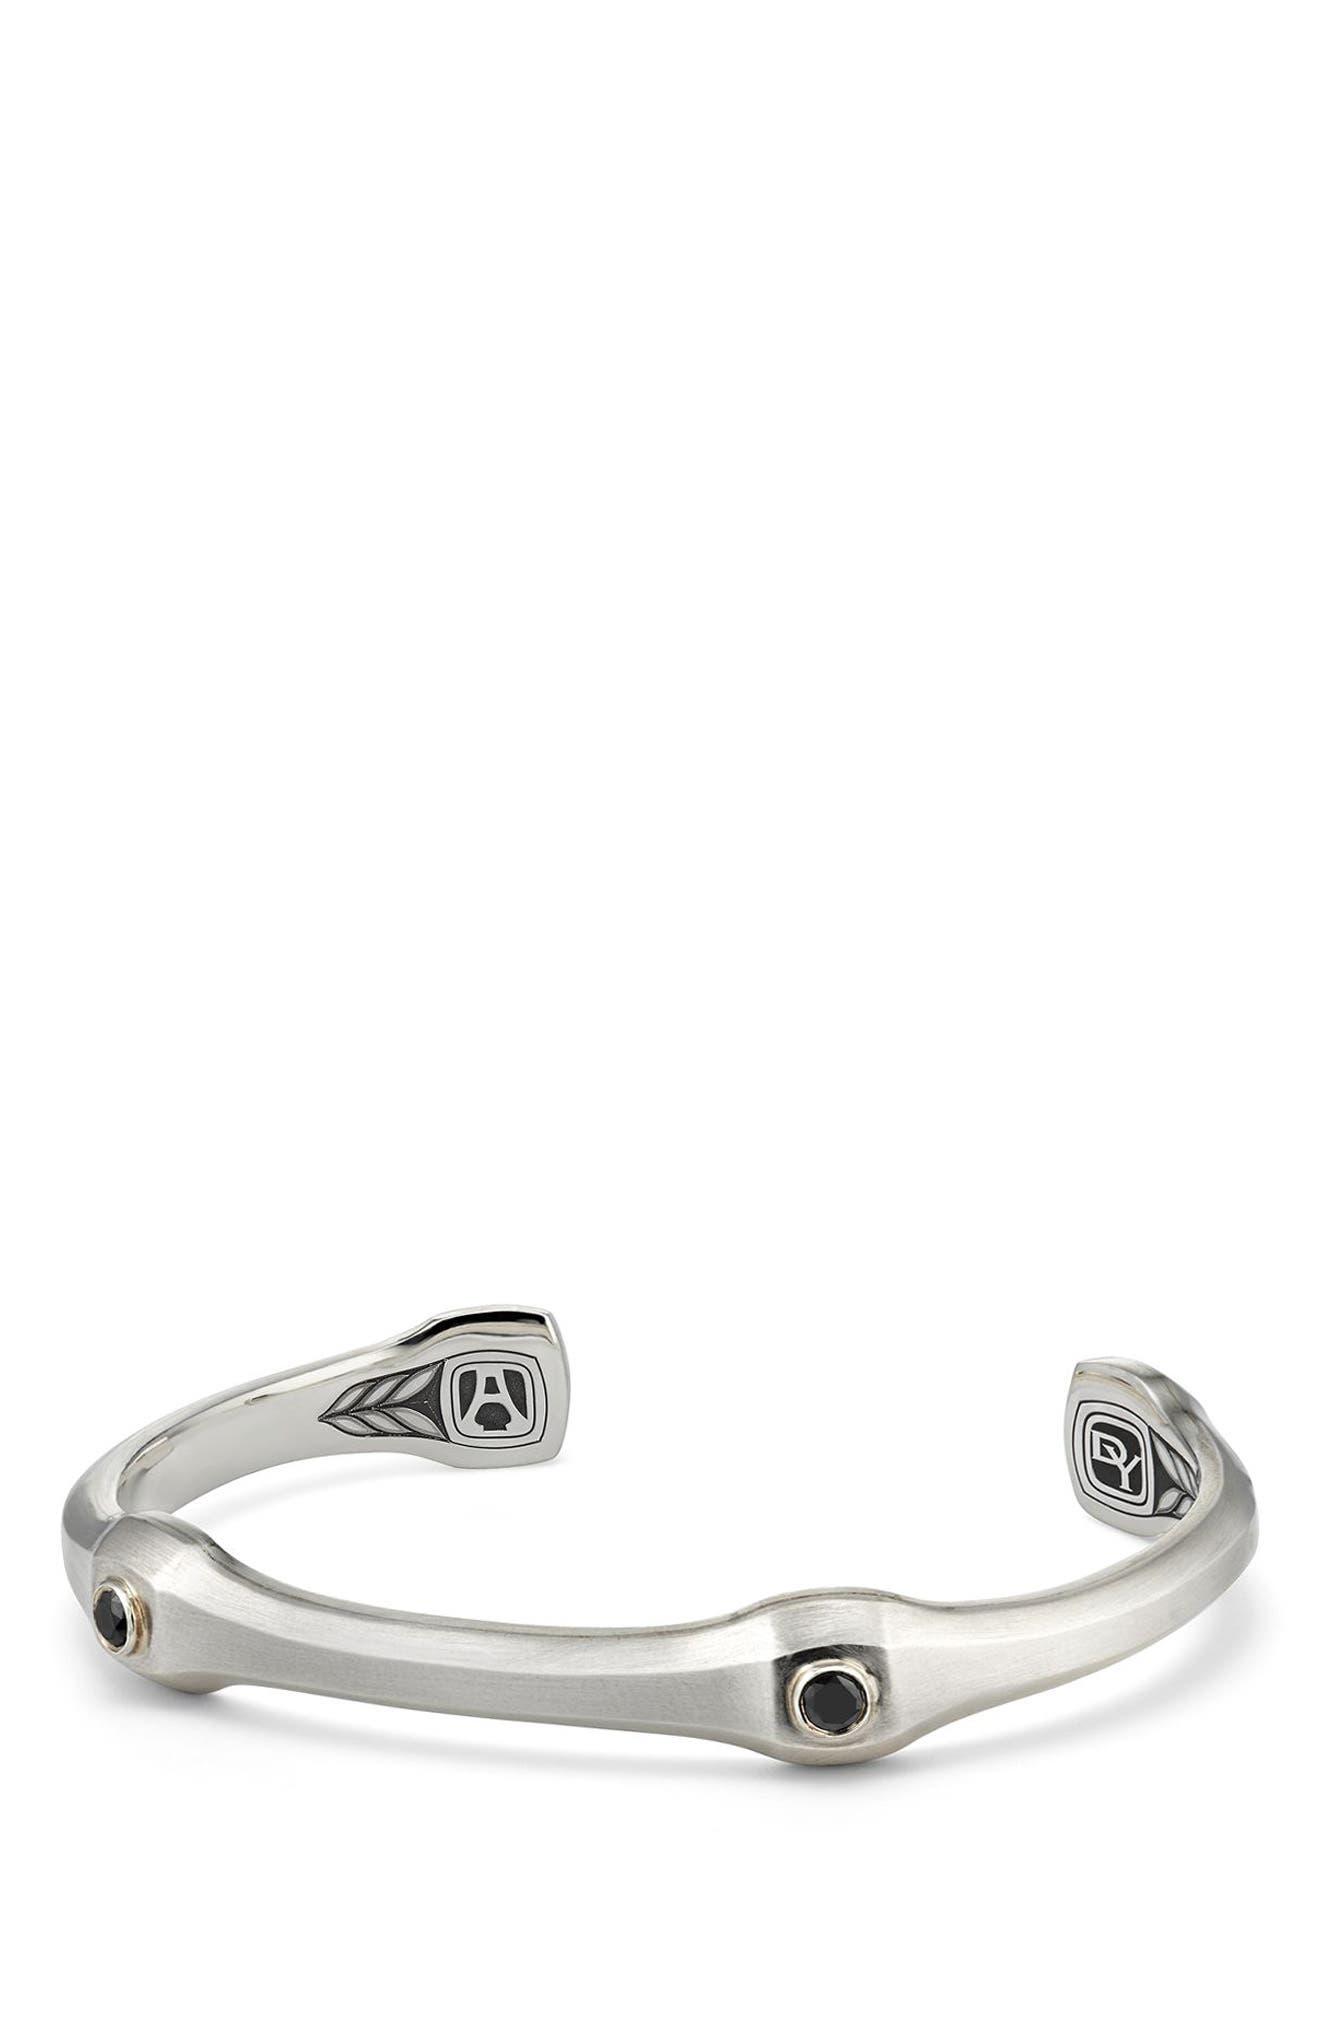 Anvil Cuff Bracelet with Black Diamond, 10.5mm,                             Main thumbnail 1, color,                             SILVER/ BLACK DIAMOND